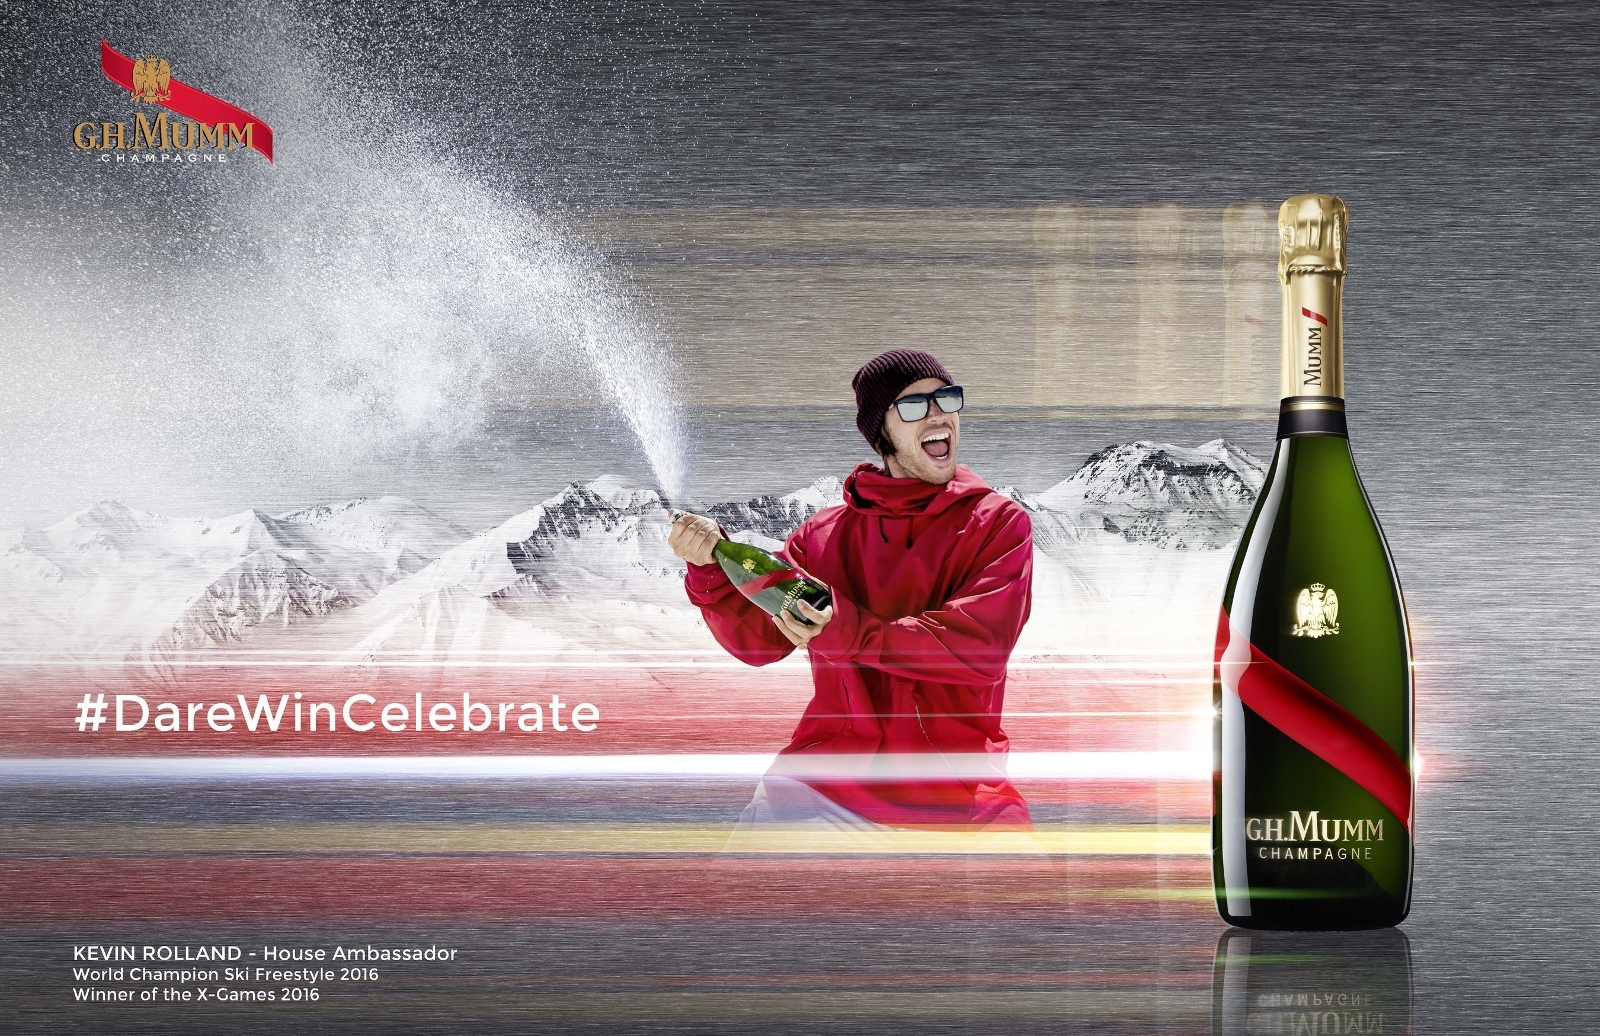 kevin-rolland-mumm-champagne-sponsoring